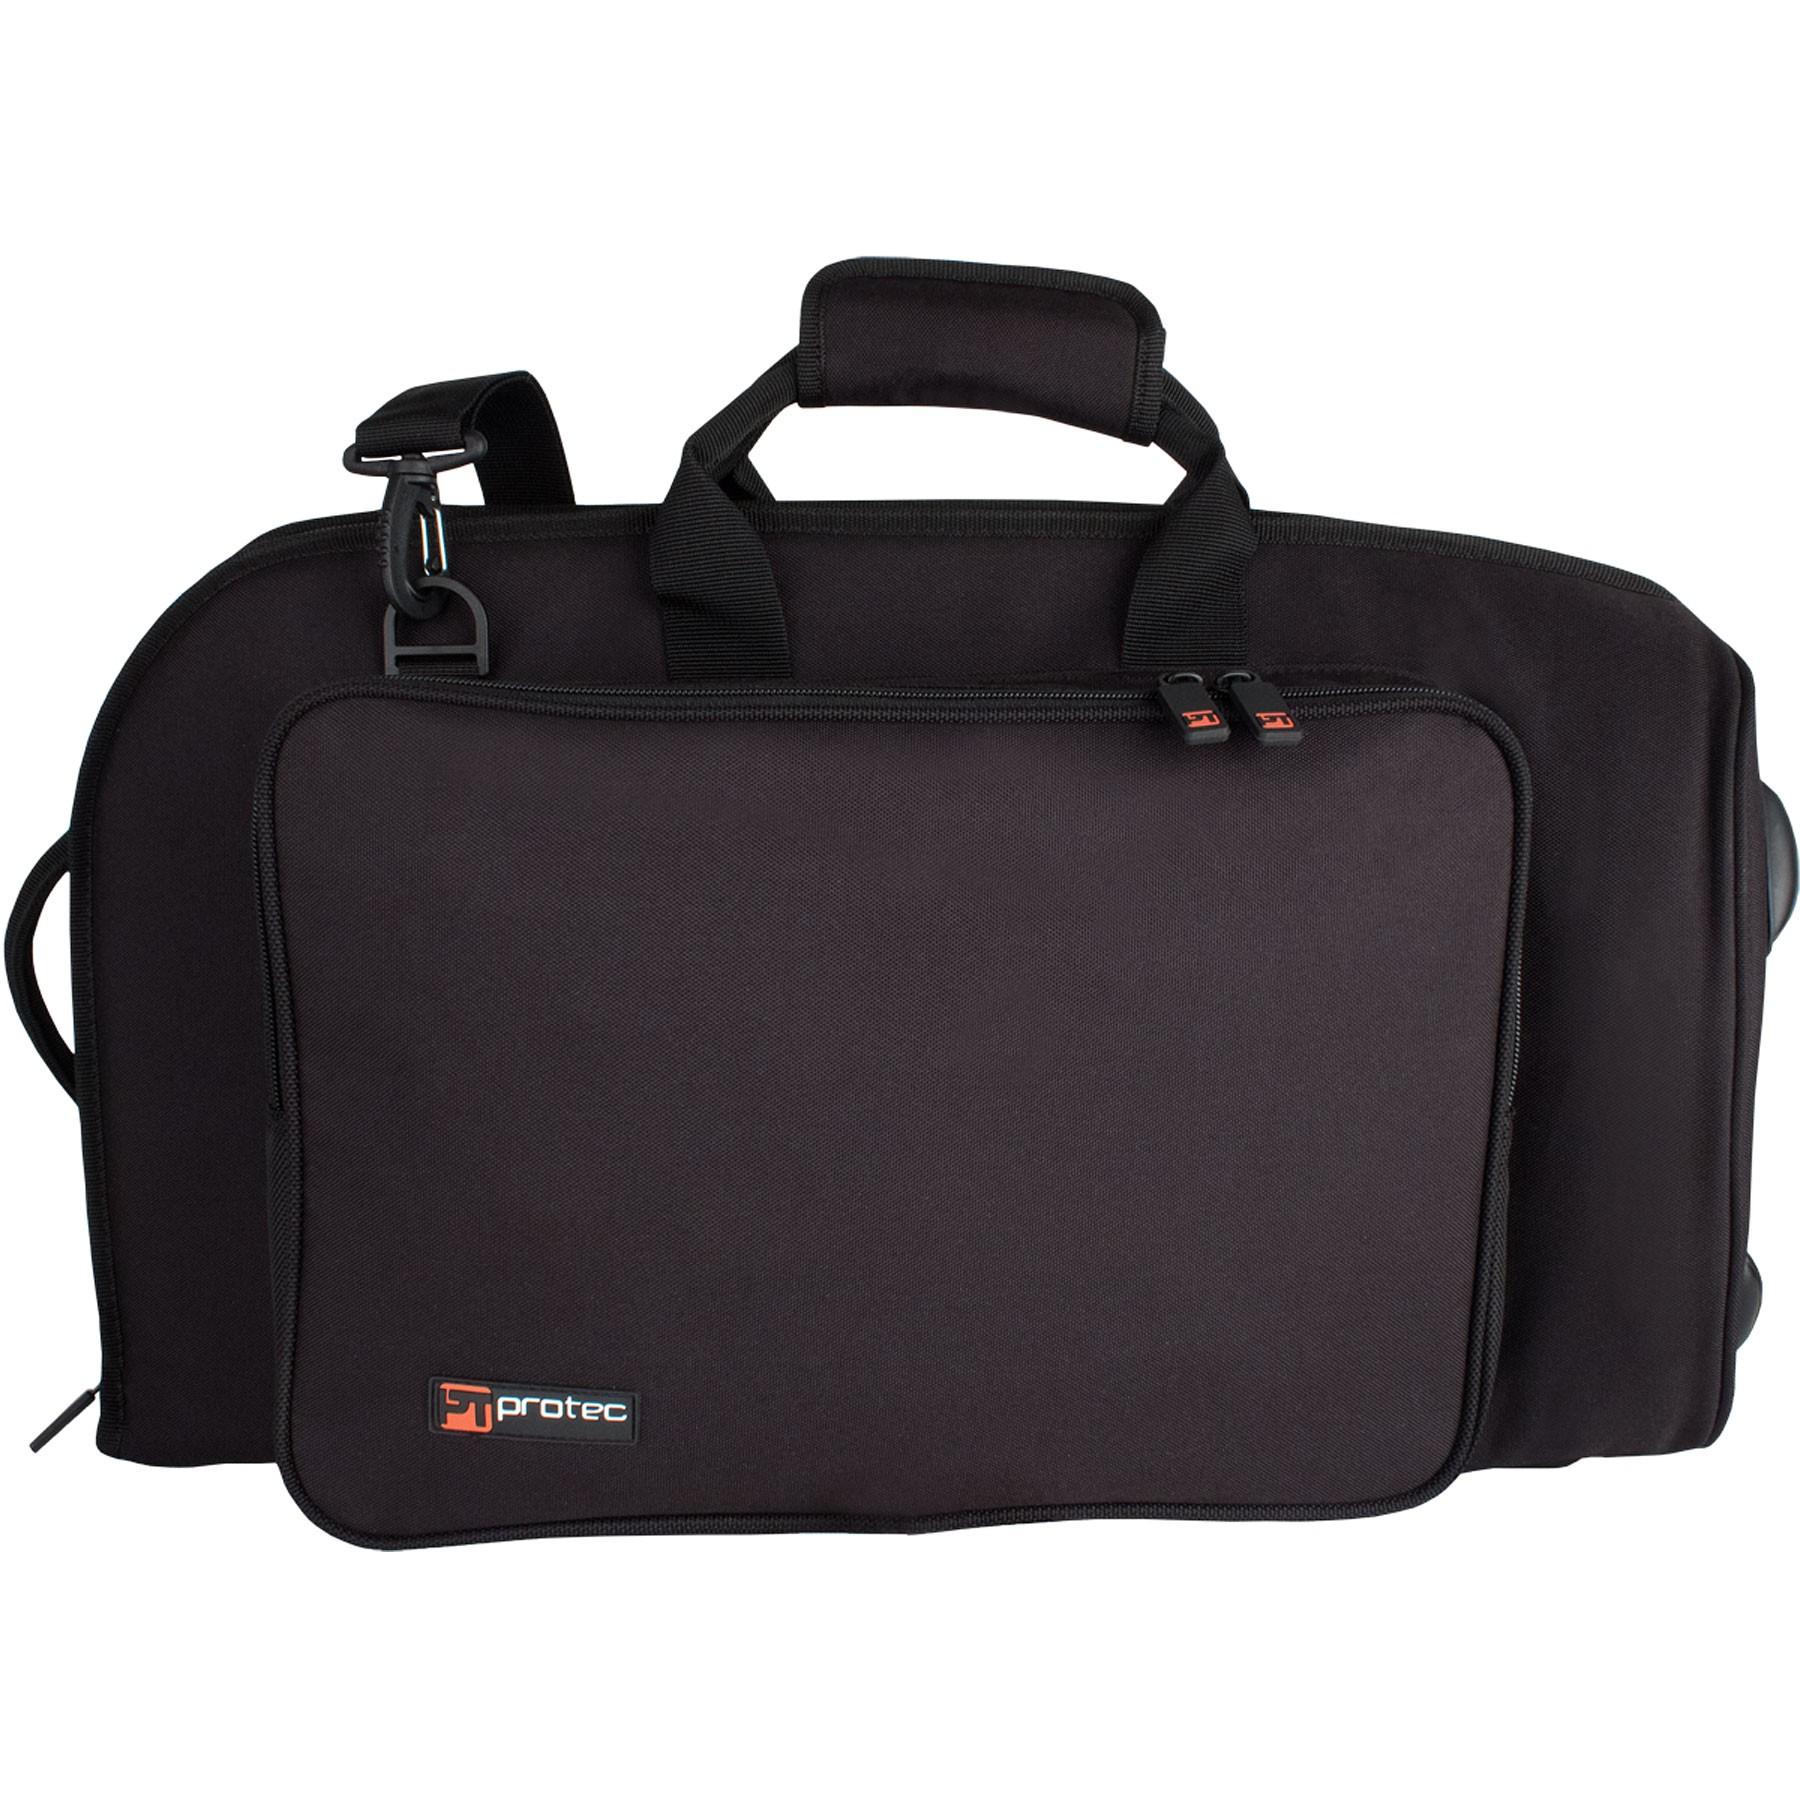 Protec Flugelhorn Explorer Gig Bag with Sheet Music Pocket (C244X)